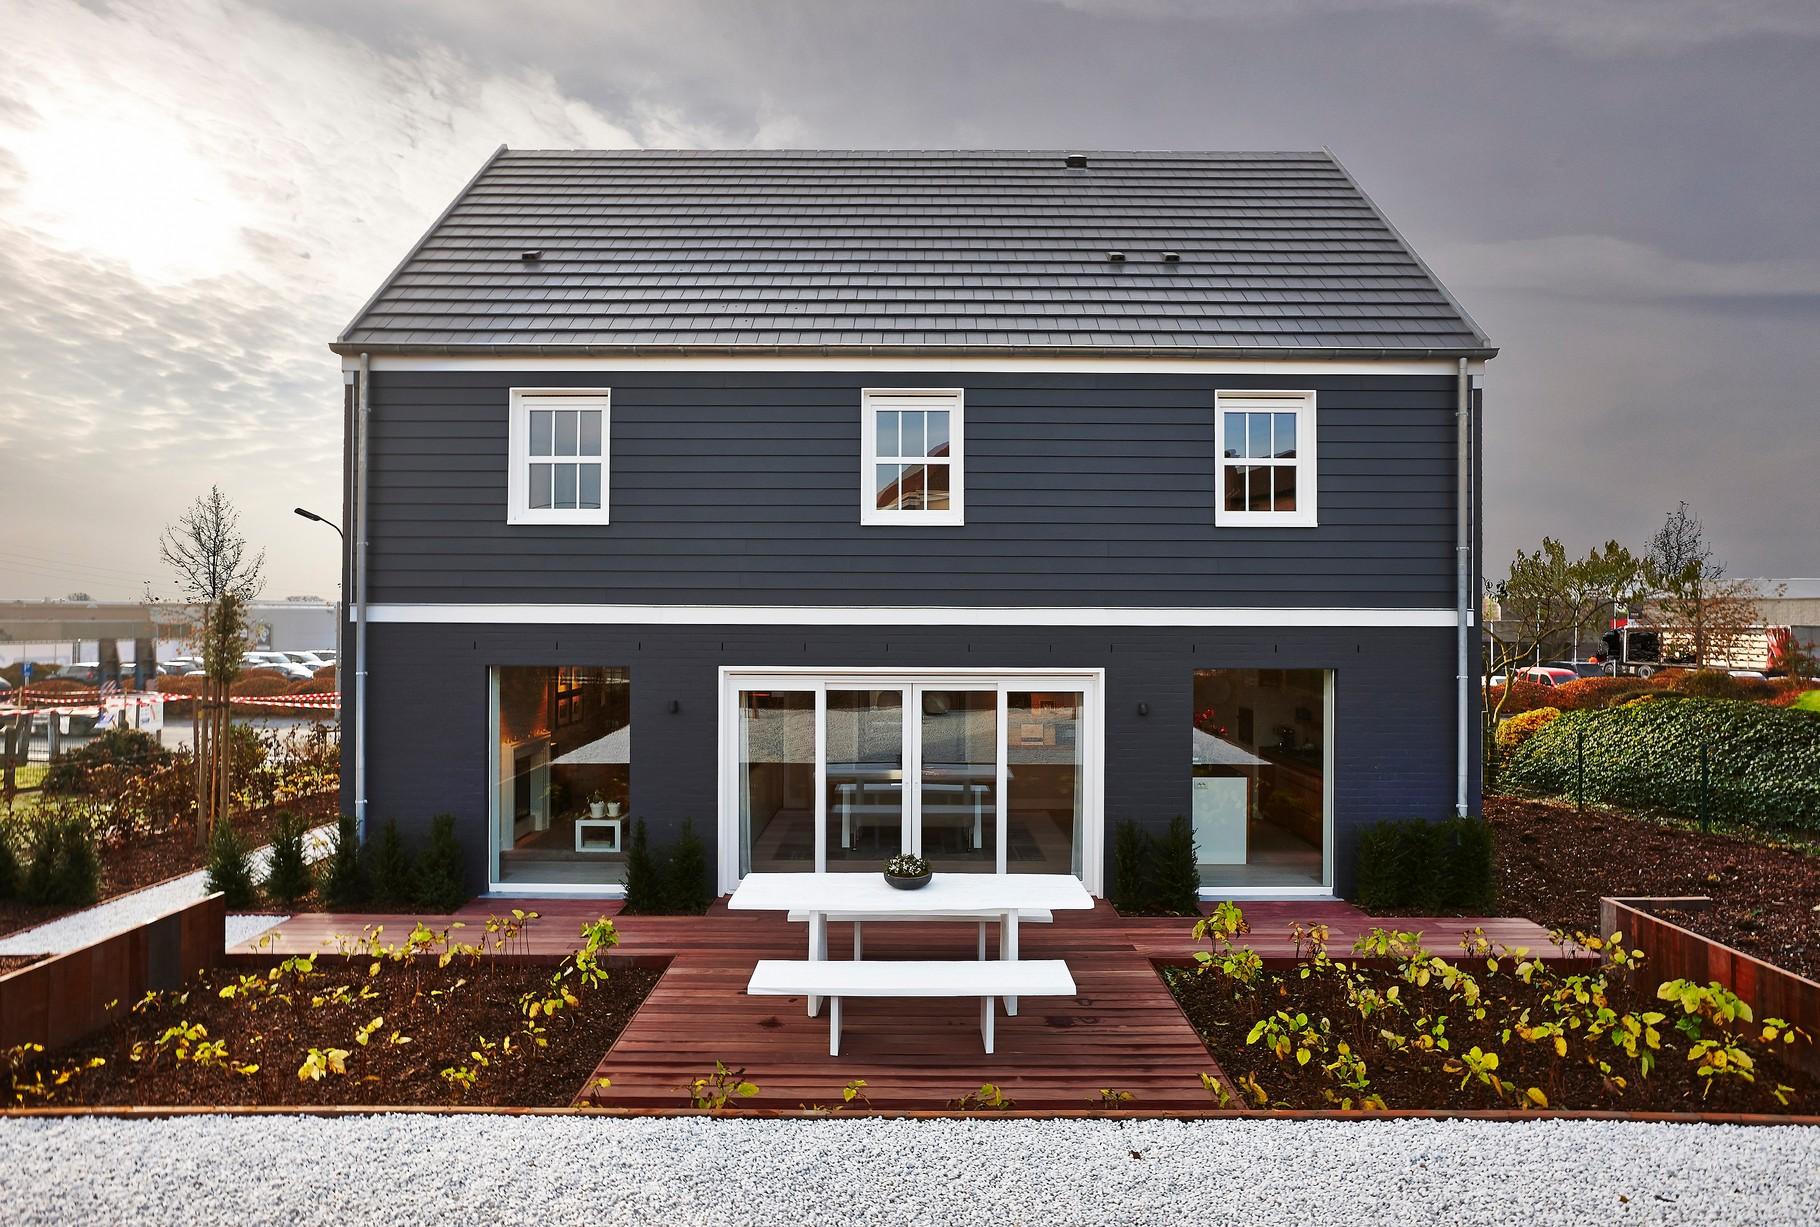 Mi casa luxembourg maisons de style en bois massif mi for Kofferliege micasa